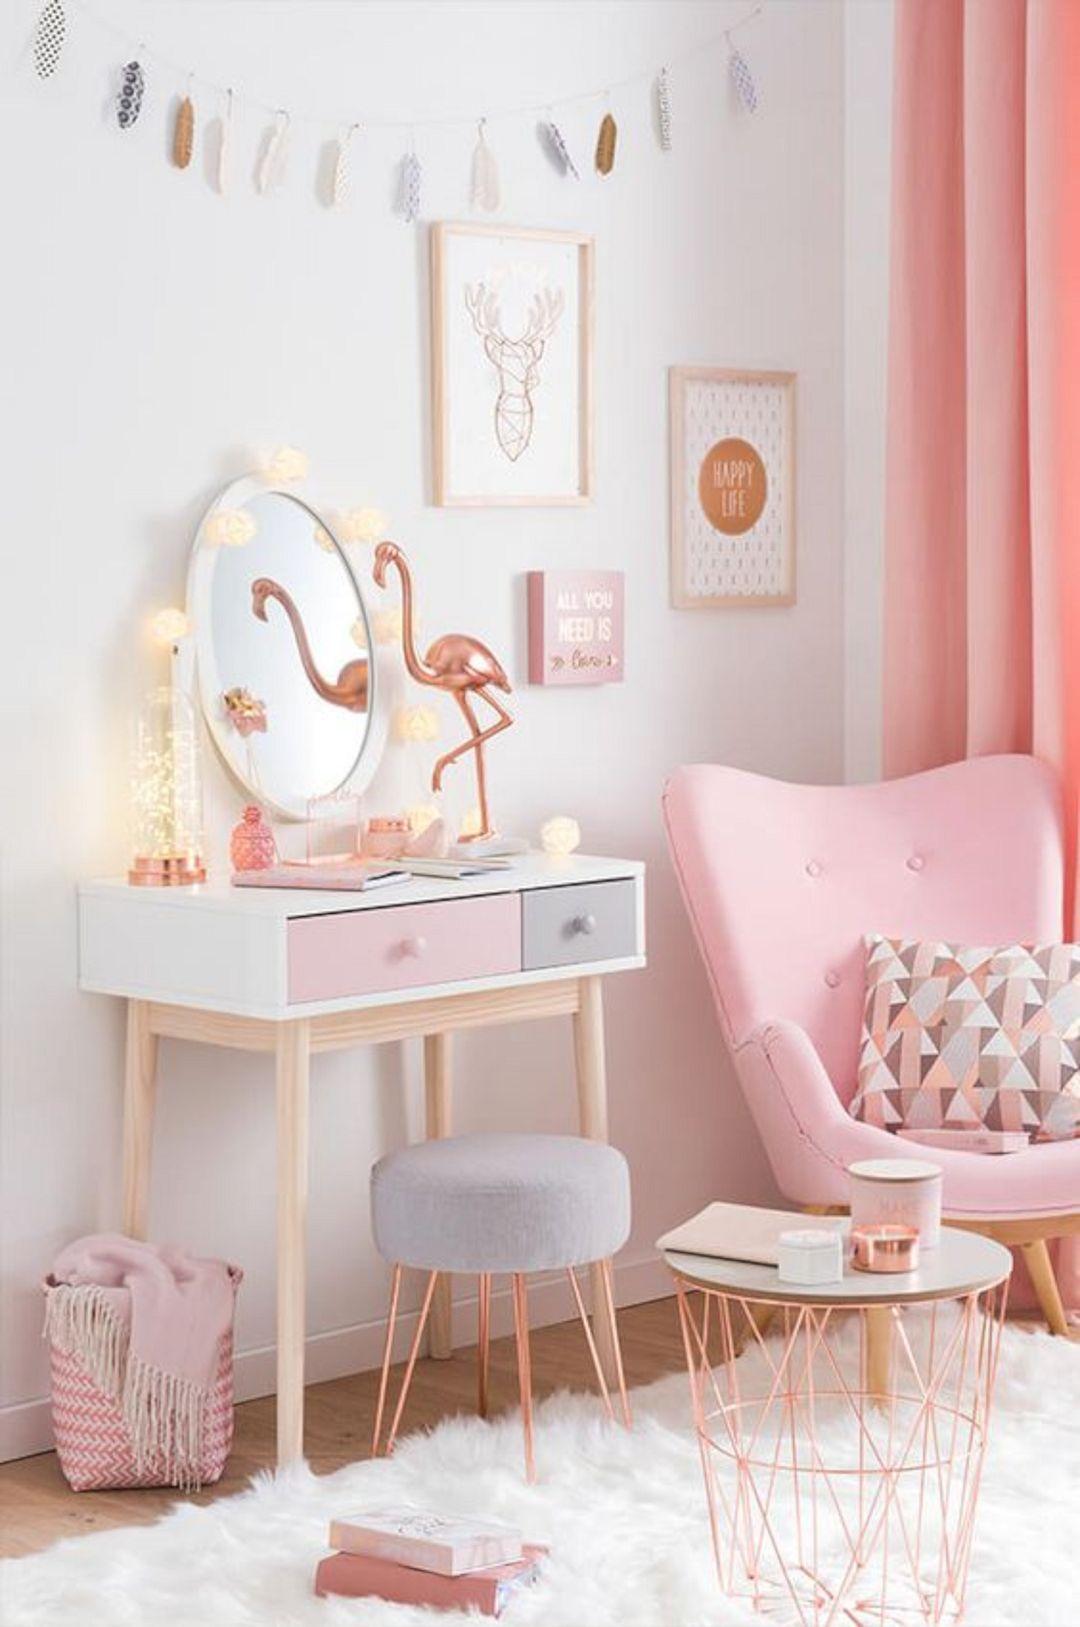 Gentil 18 Cute DIY Girly Home Decor Ideas